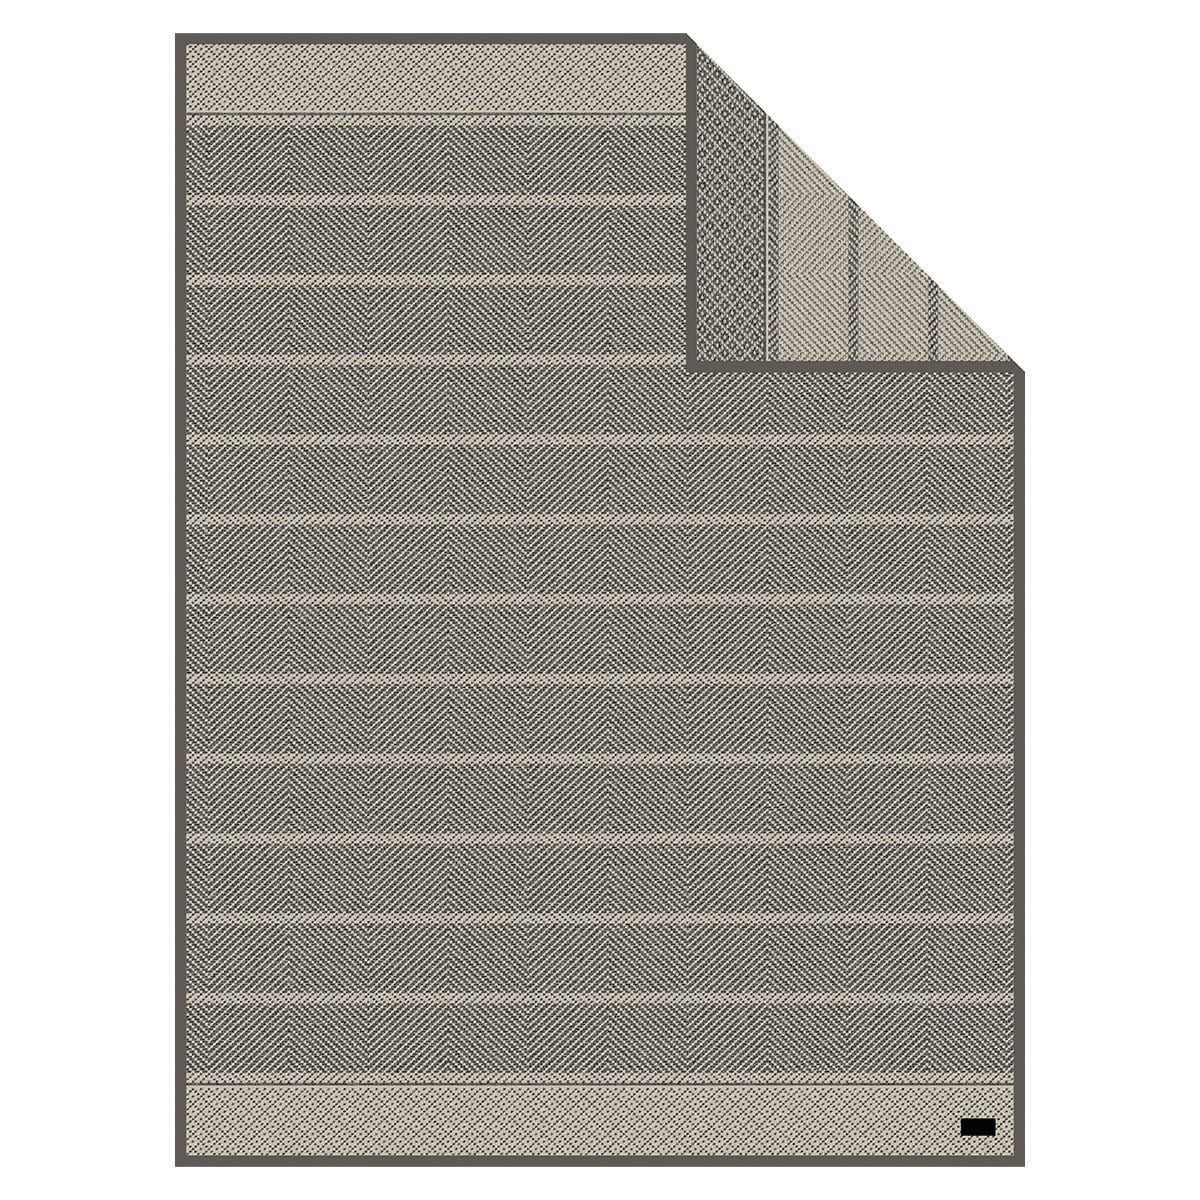 ibena jacquard wohndecke belfort grau g nstig online kaufen bei bettwaren shop. Black Bedroom Furniture Sets. Home Design Ideas